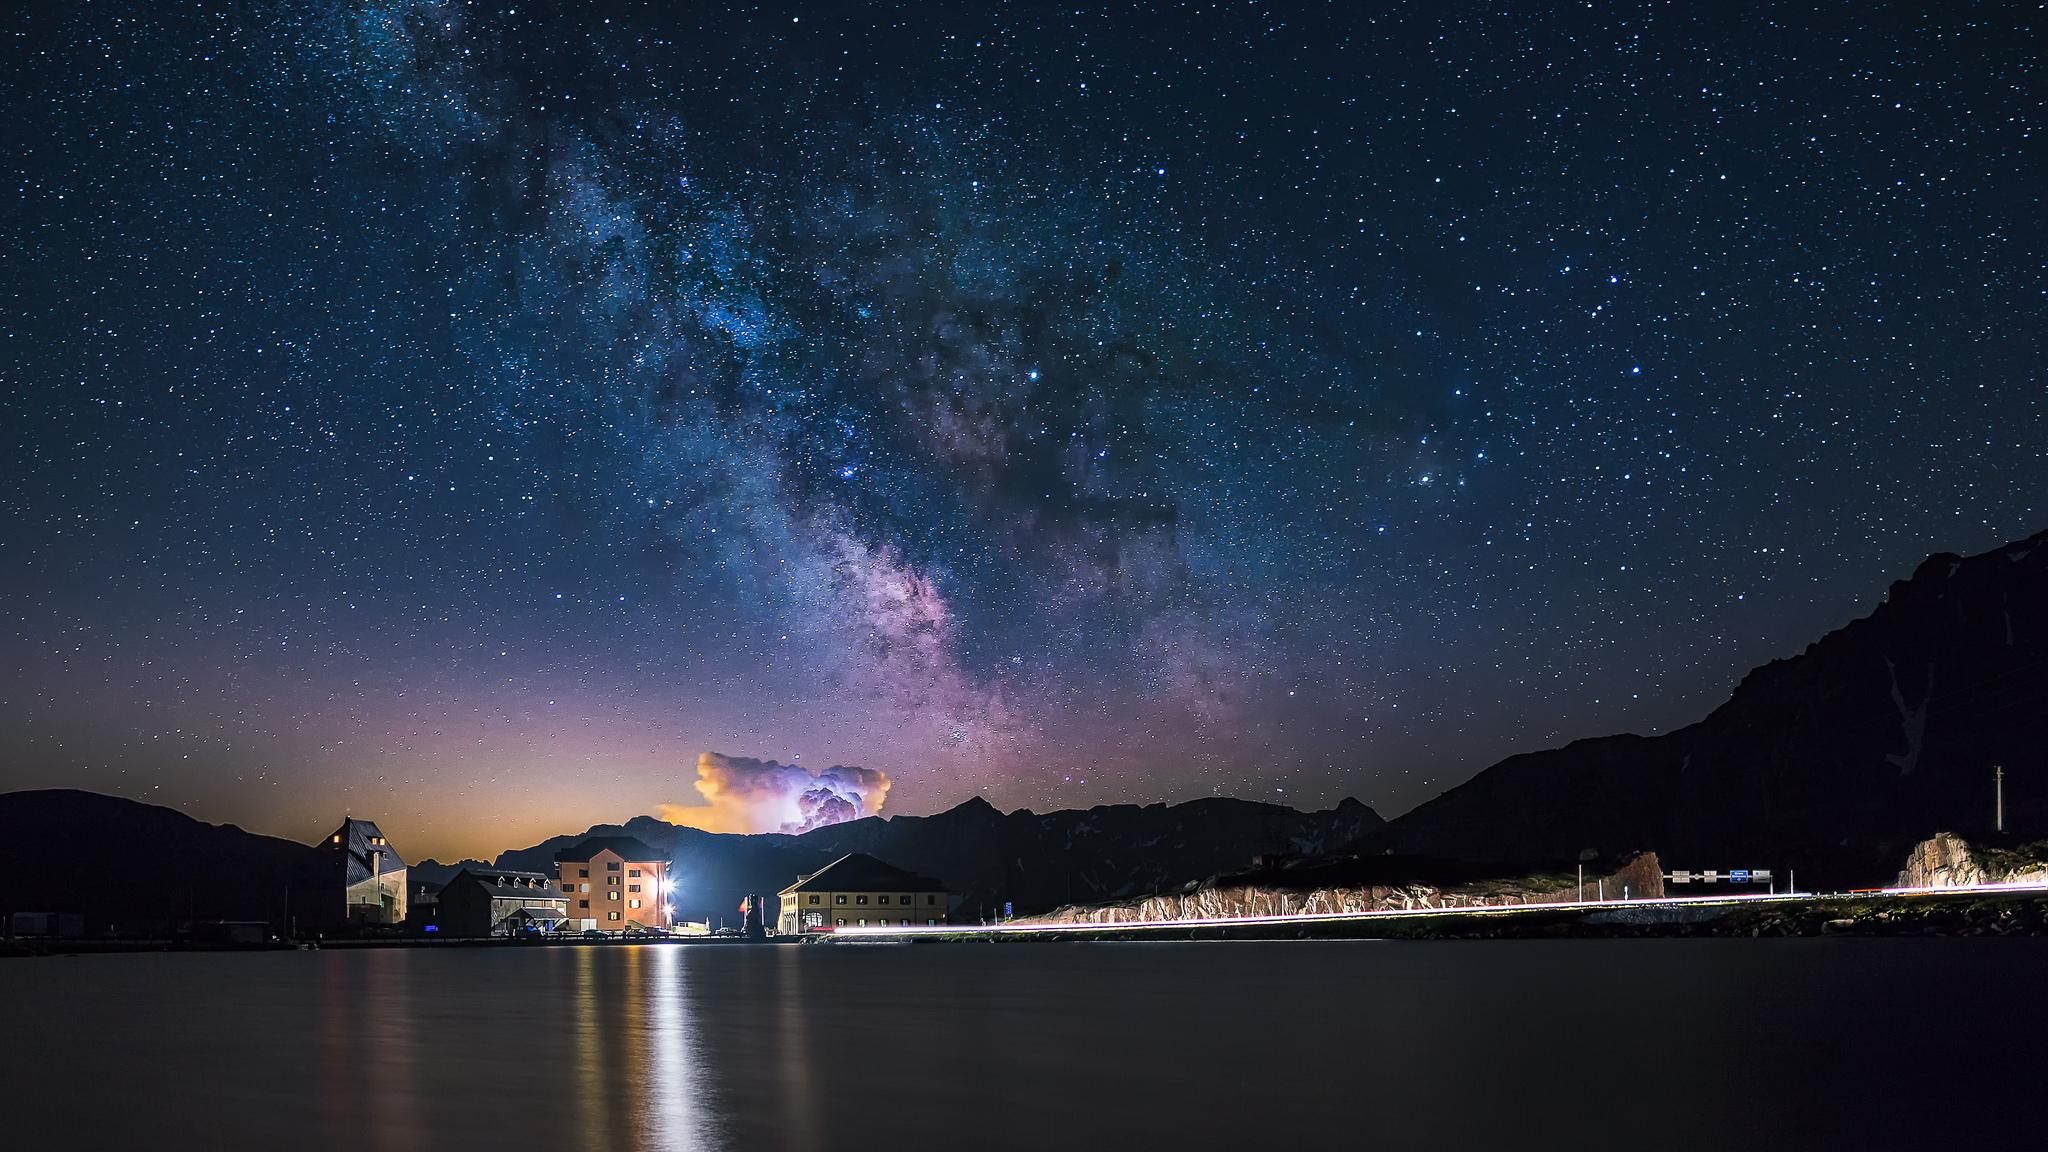 Ospizio San Gottardo Milky Way by Lukas Schlagenhauf.